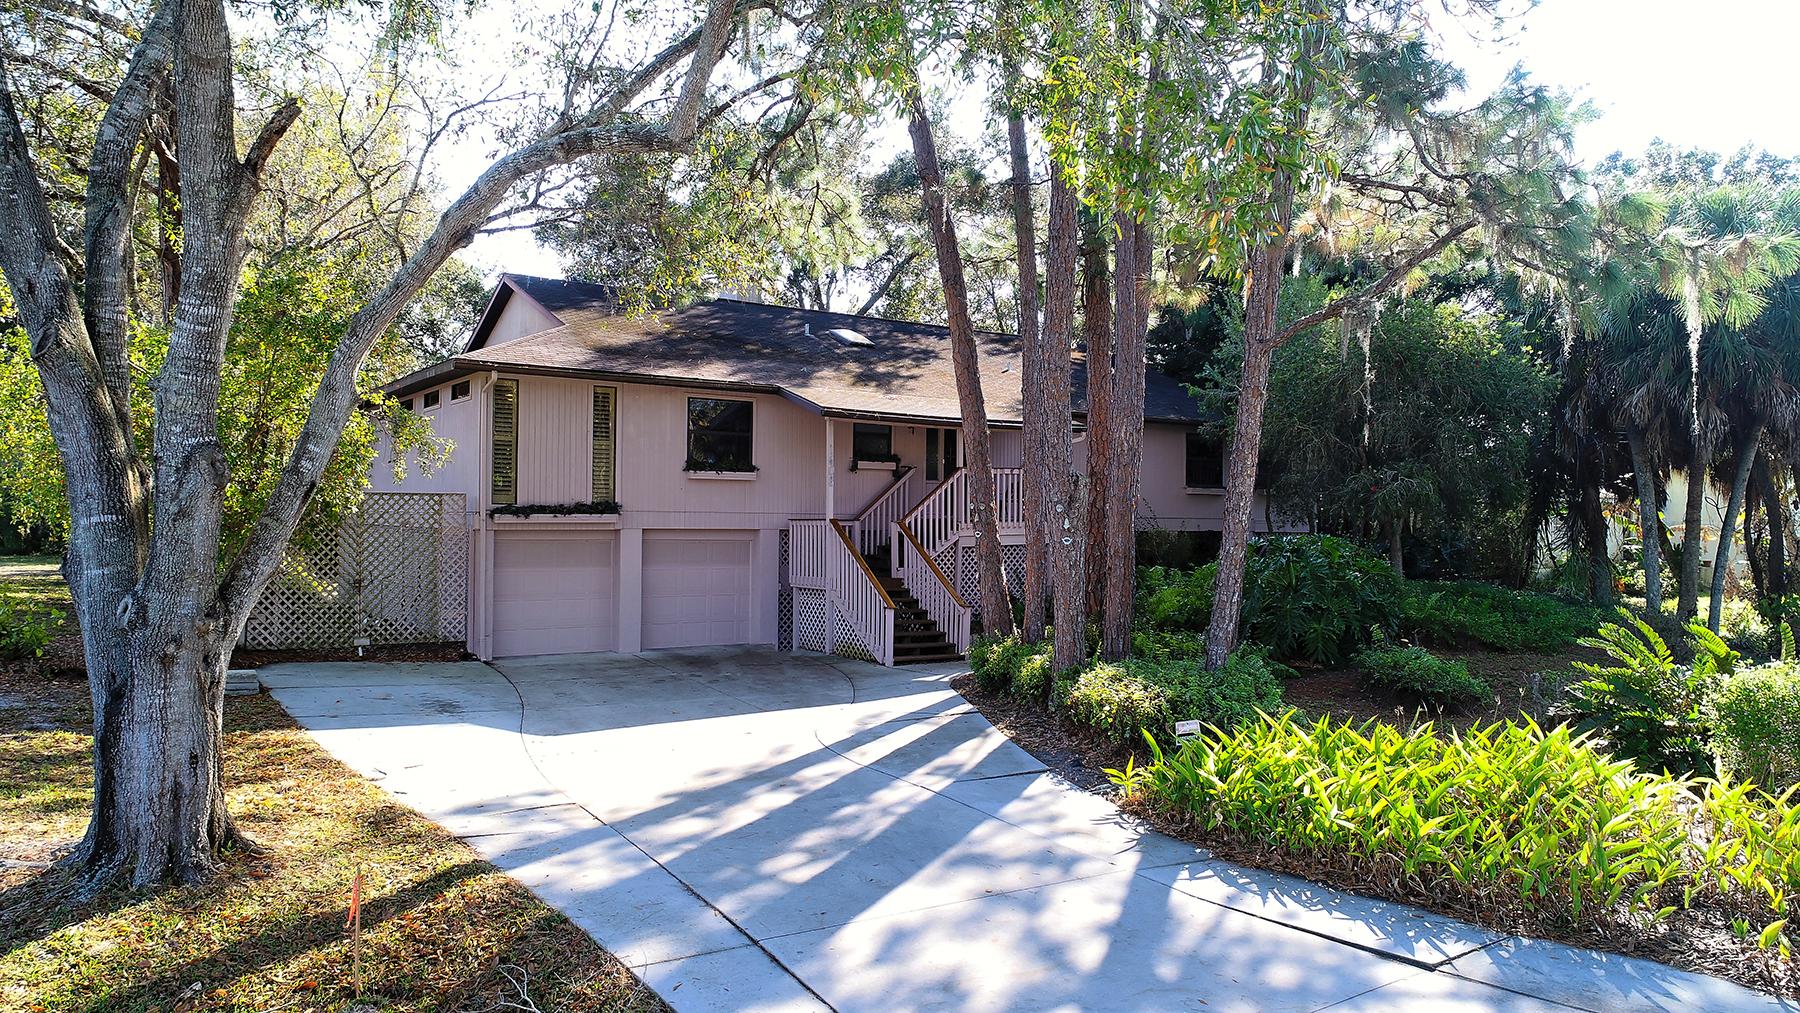 Casa para uma família para Venda às SPOONBILL HAMMOCK 1608 Hammock Dr Nokomis, Florida, 34275 Estados Unidos